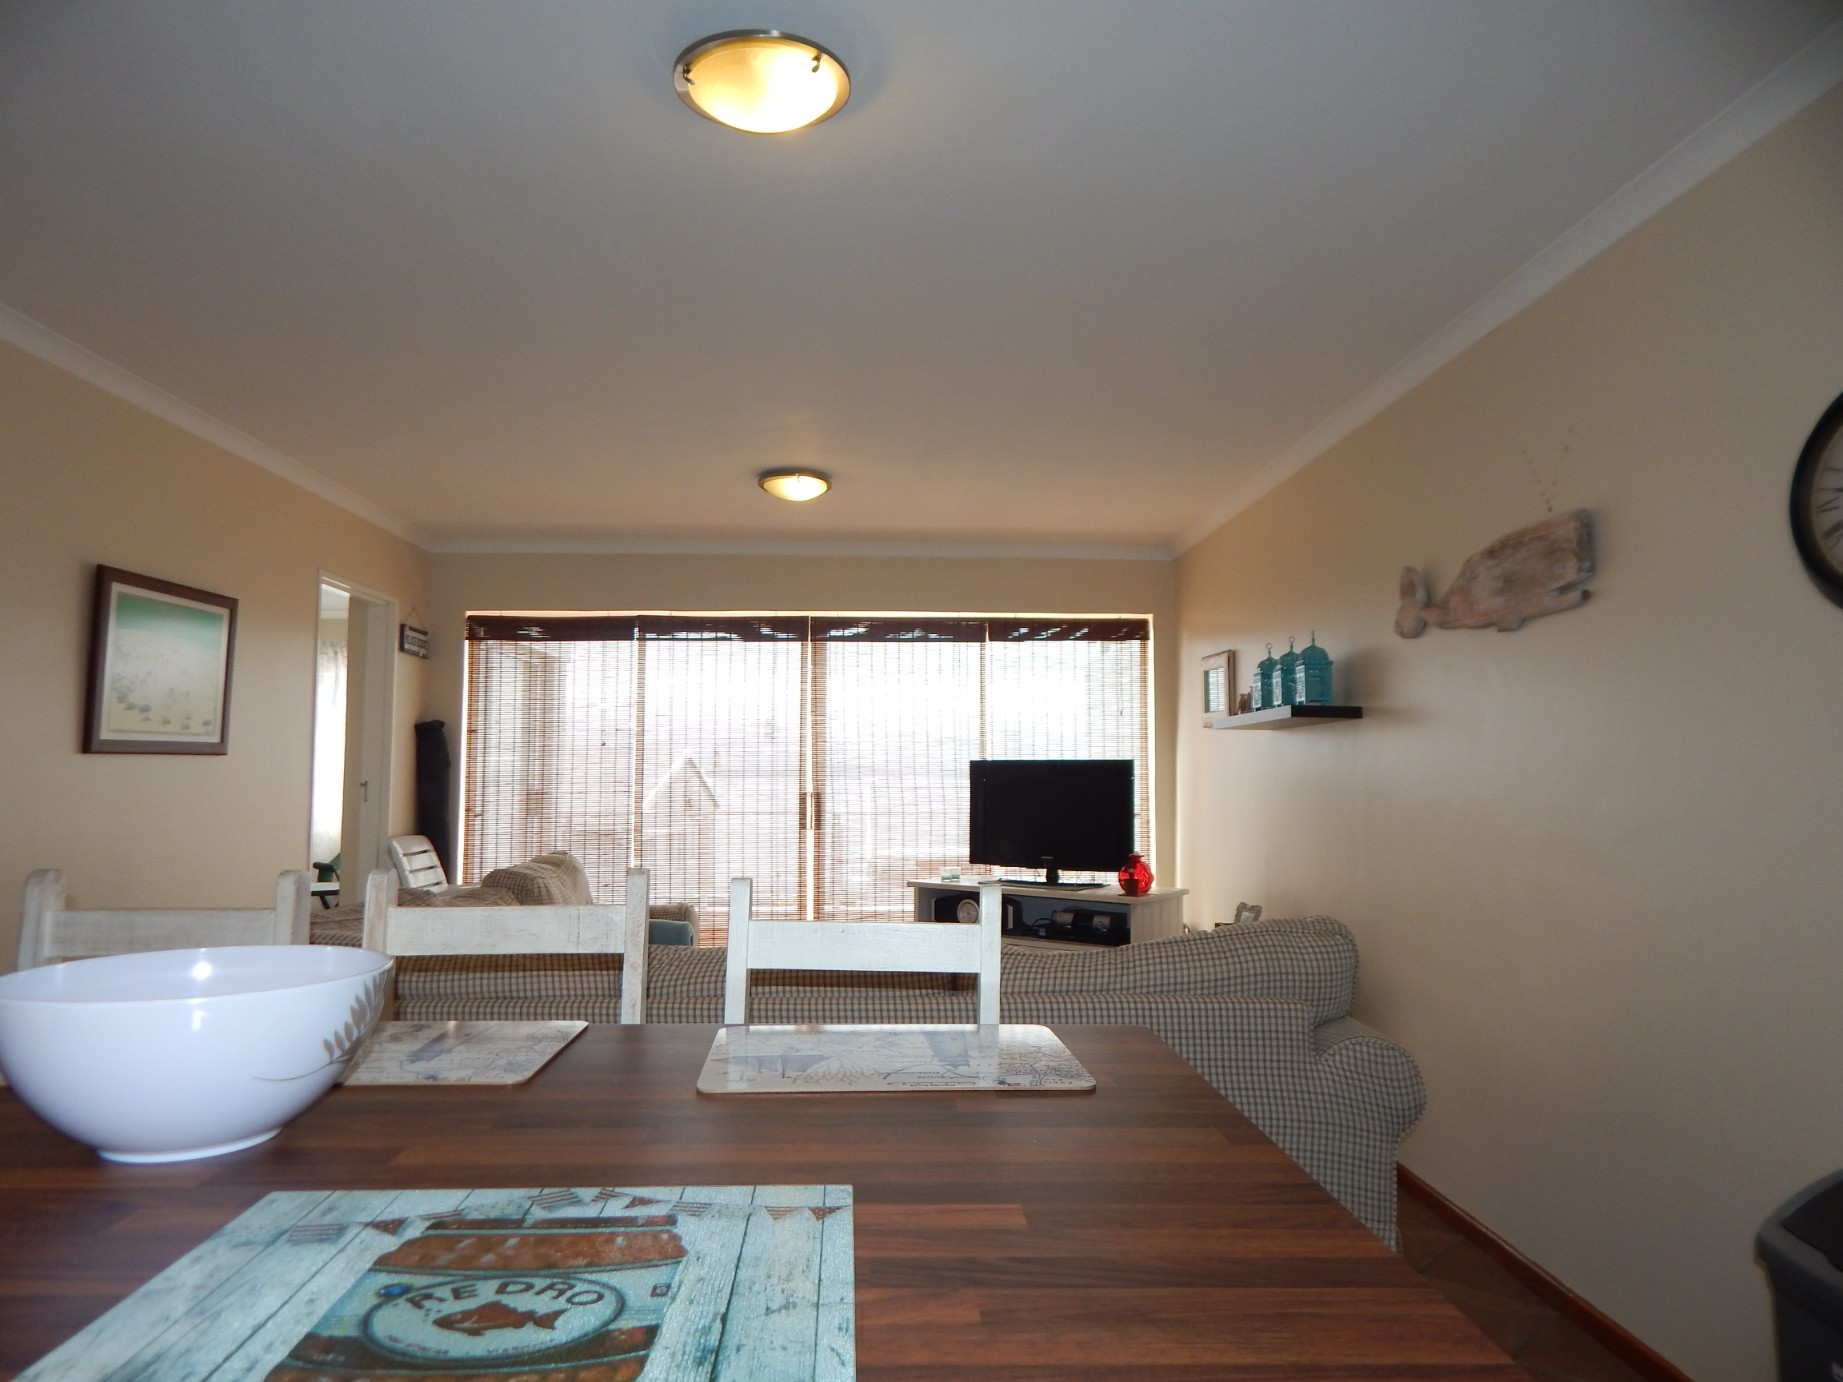 3 Bedroom Apartment for sale in De Bakke ENT0066483 : photo#12